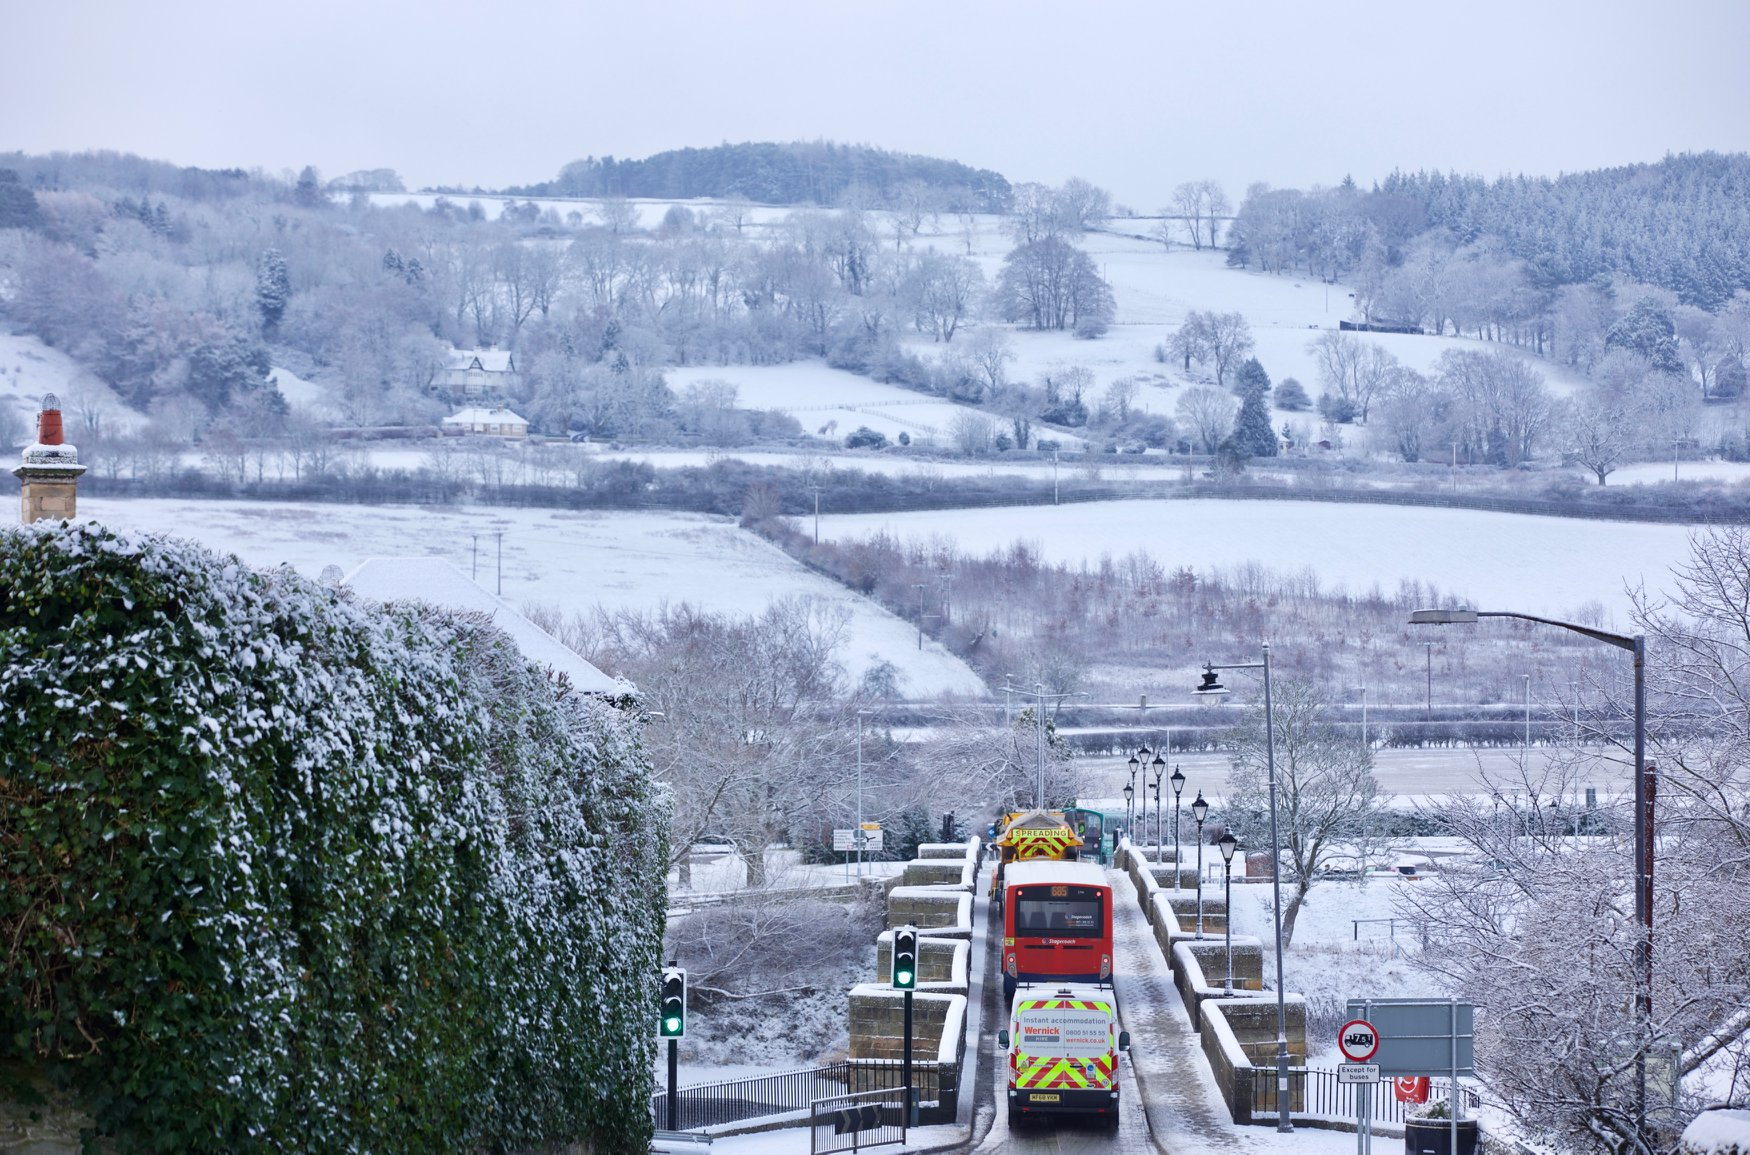 Corbridge Bridge in the Snow